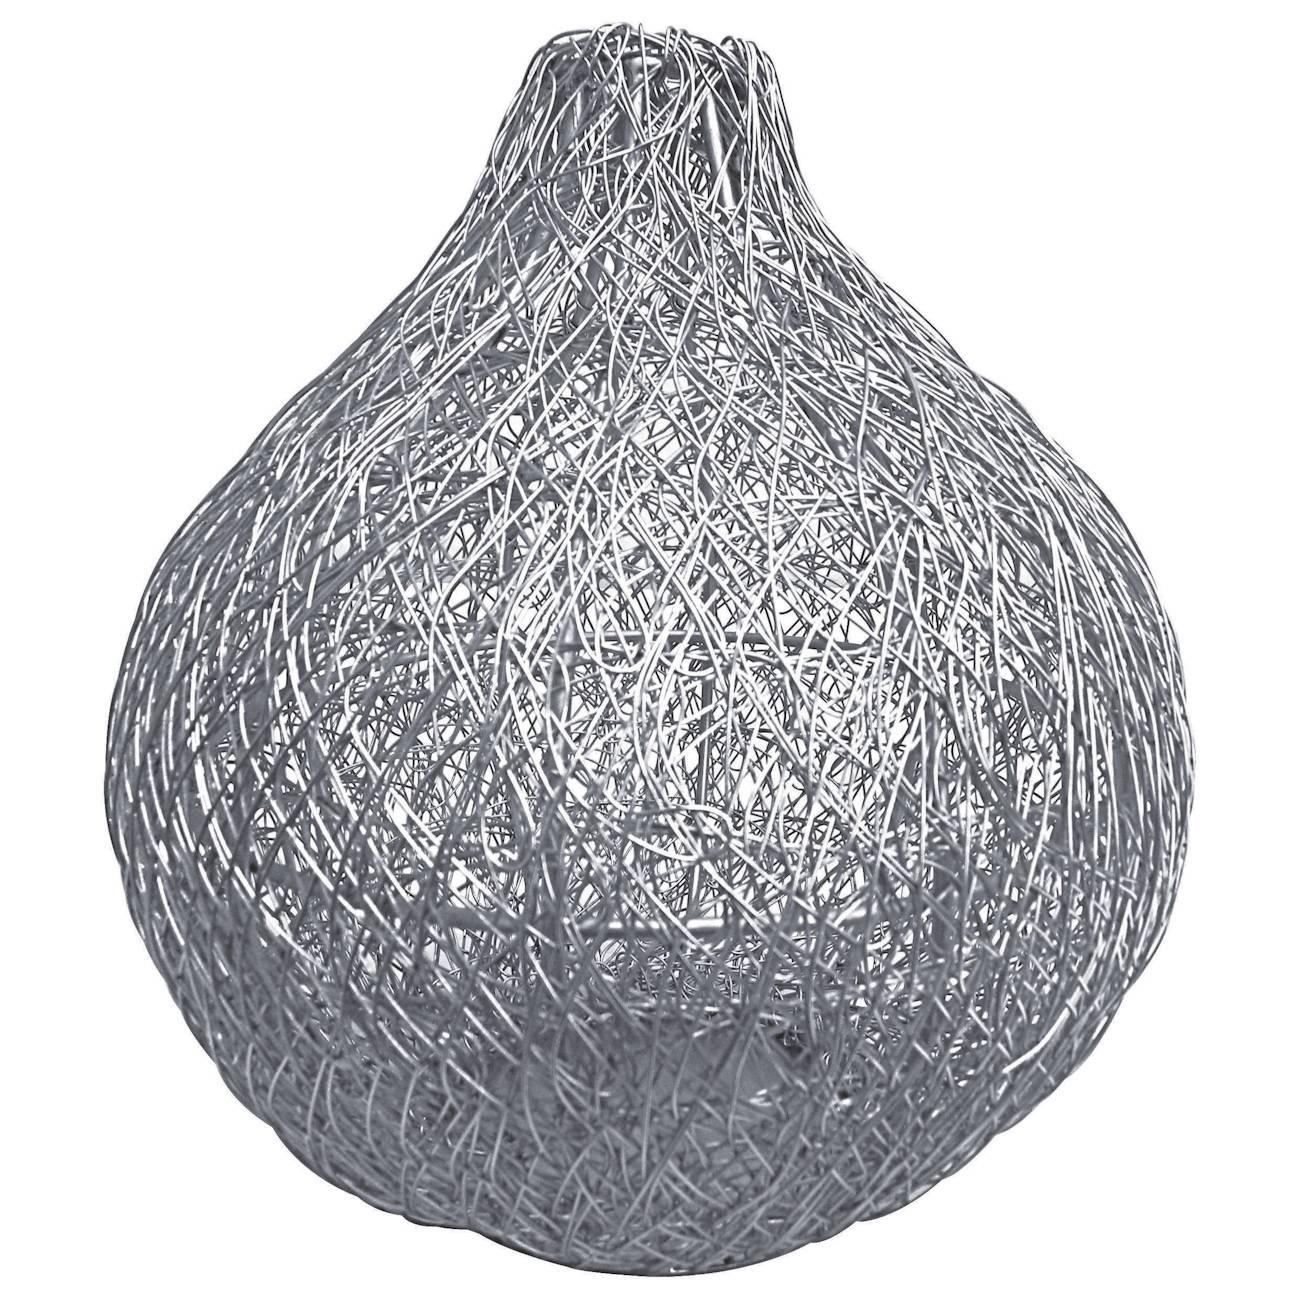 Vaso Nickle Prata em Metal - Prestige - 23 cm